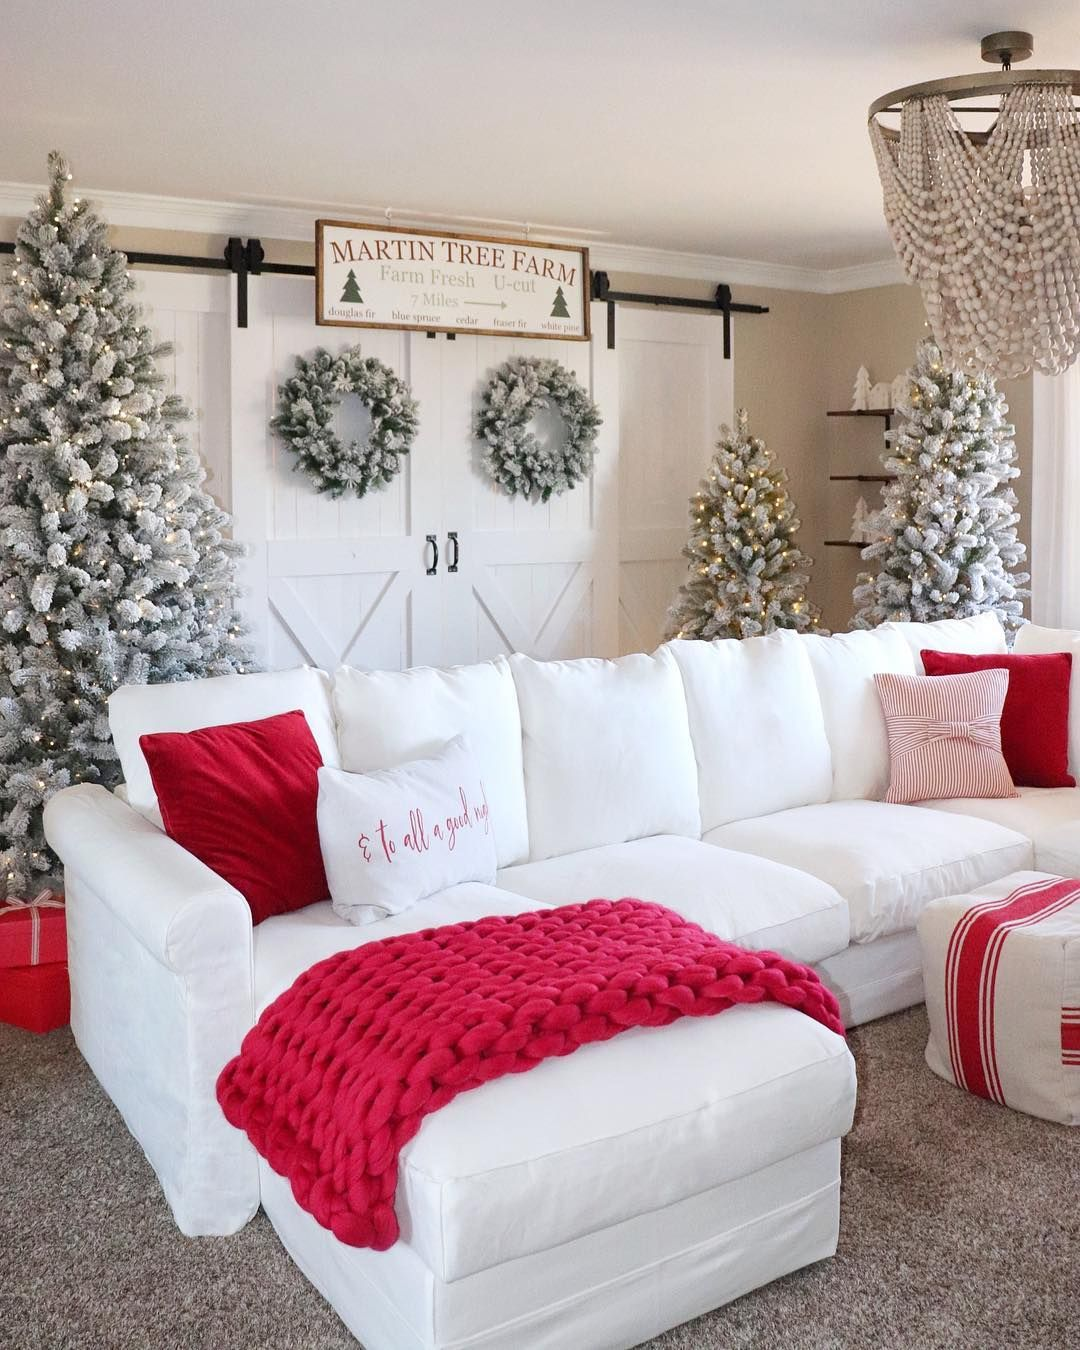 Christmas Decor Ideas Christmas Ideas Christmas Decorations Christmas Deco Christmas Decorations Living Room Christmas Living Rooms Christmas Decor Inspiration